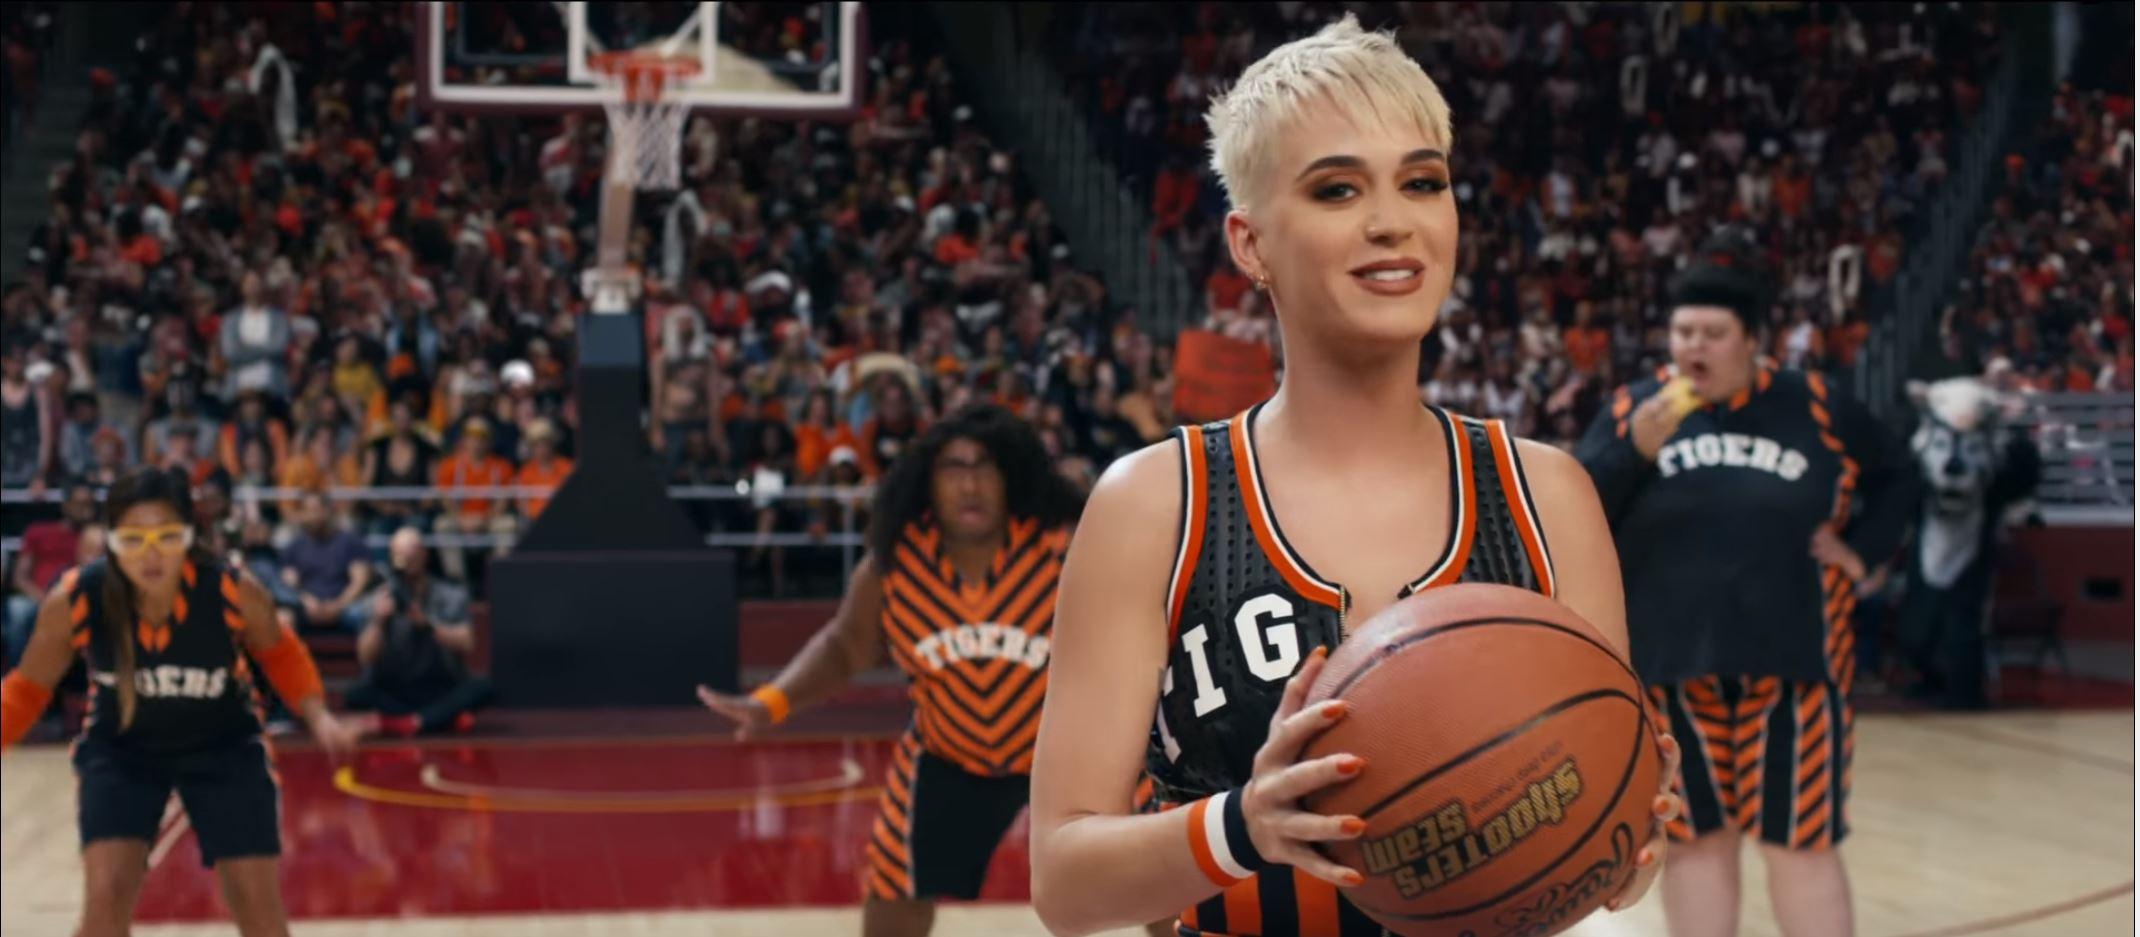 Watch The New Video With Katy Perry - Swish Swish (Official) ft. Nicki Minaj